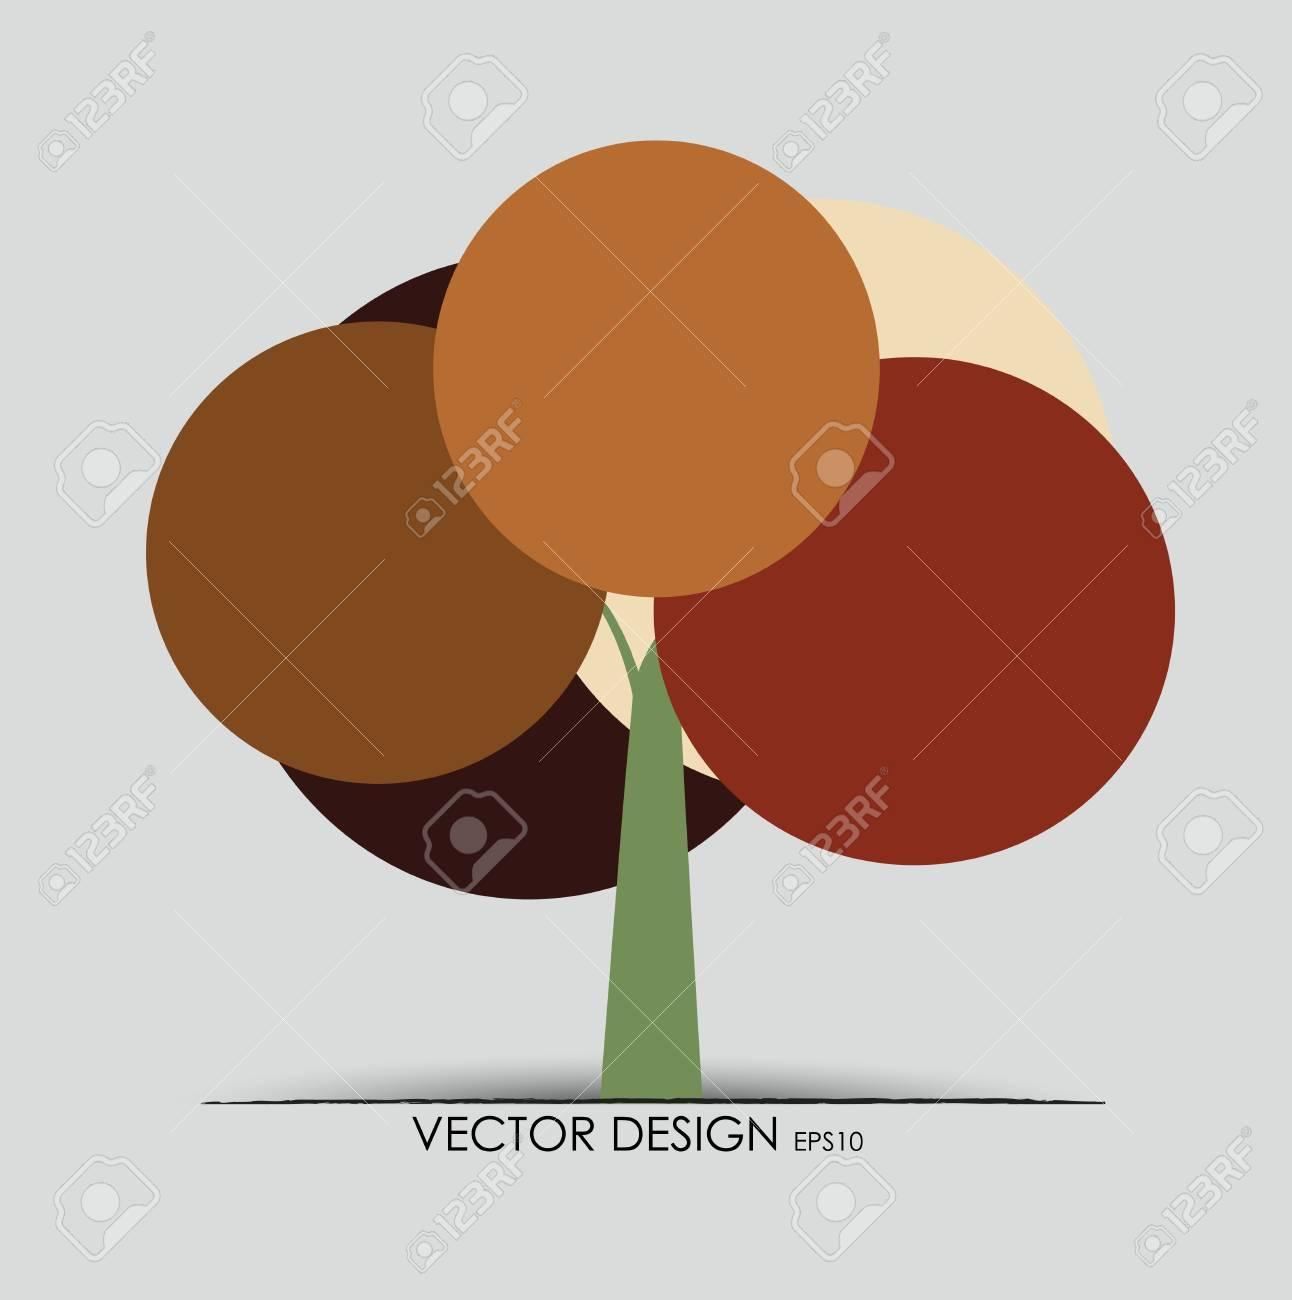 Abstract tree. Vector illustration. Stock Vector - 14927376